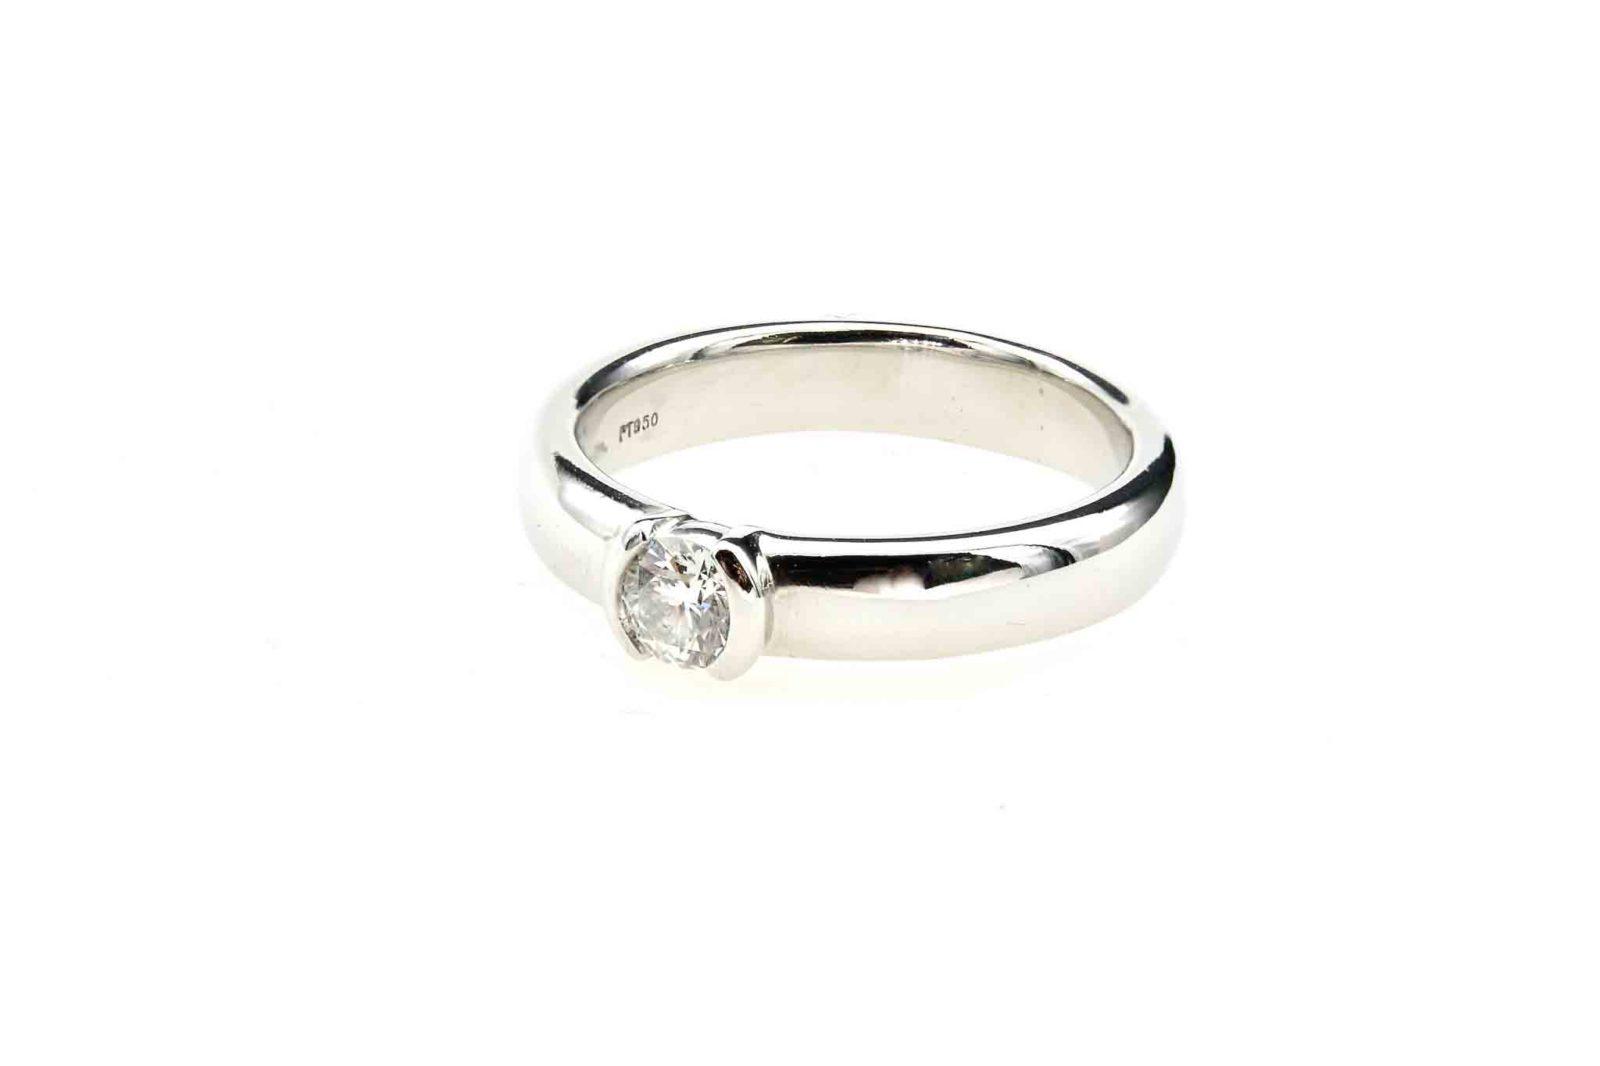 Bague Tiffany diamant solitaire